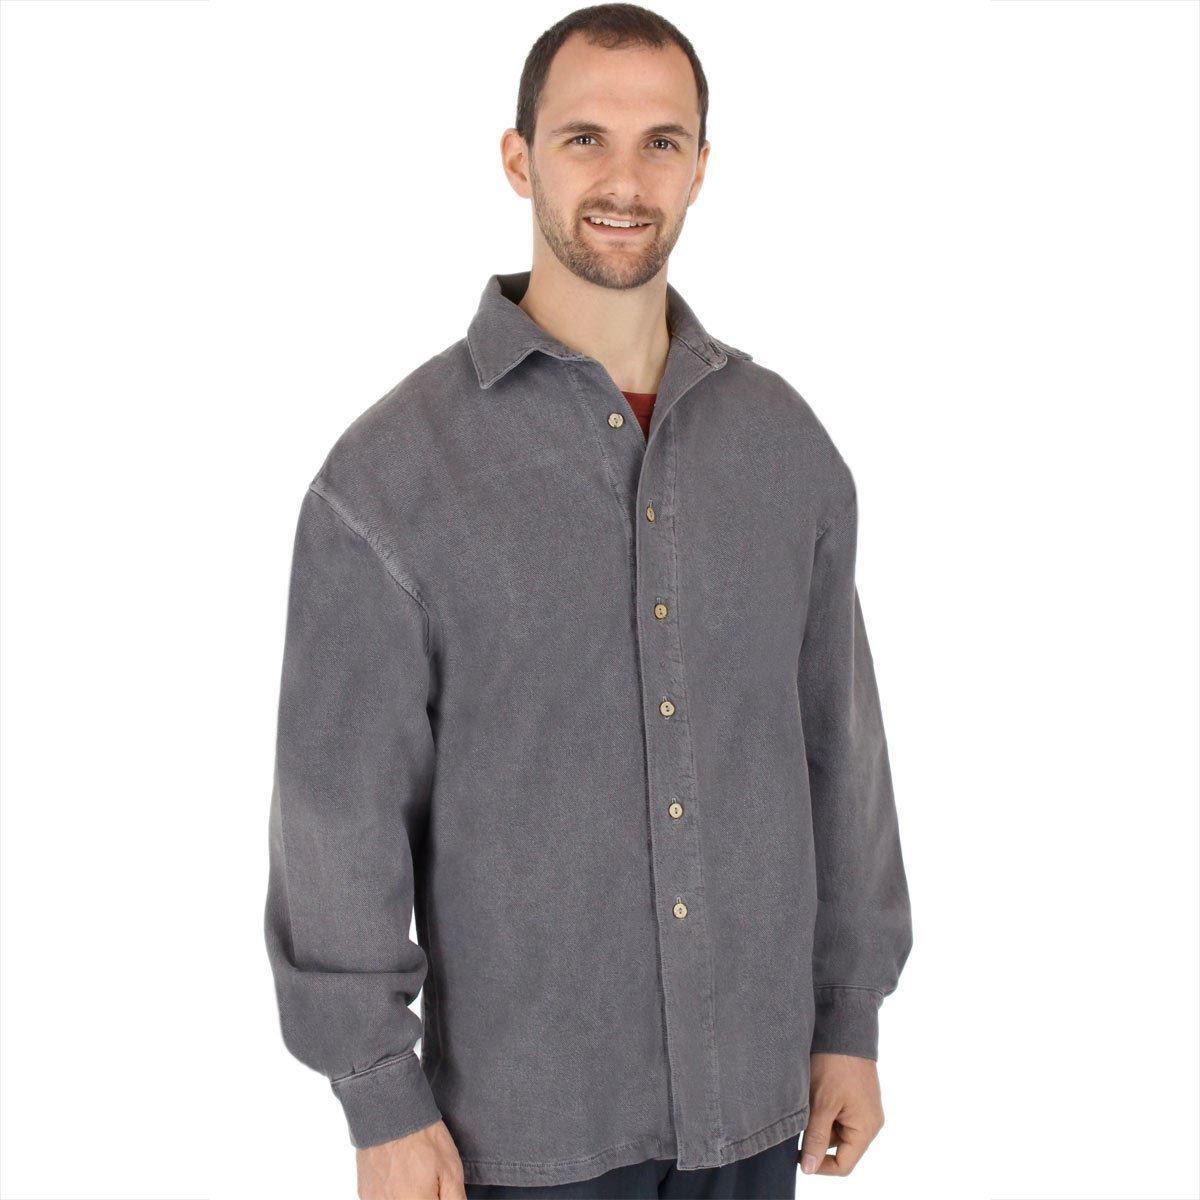 468471e594a Mens Canton Cotton Chamois Shirt - Big Easy - Sea Breeze WEK - 100% Cotton